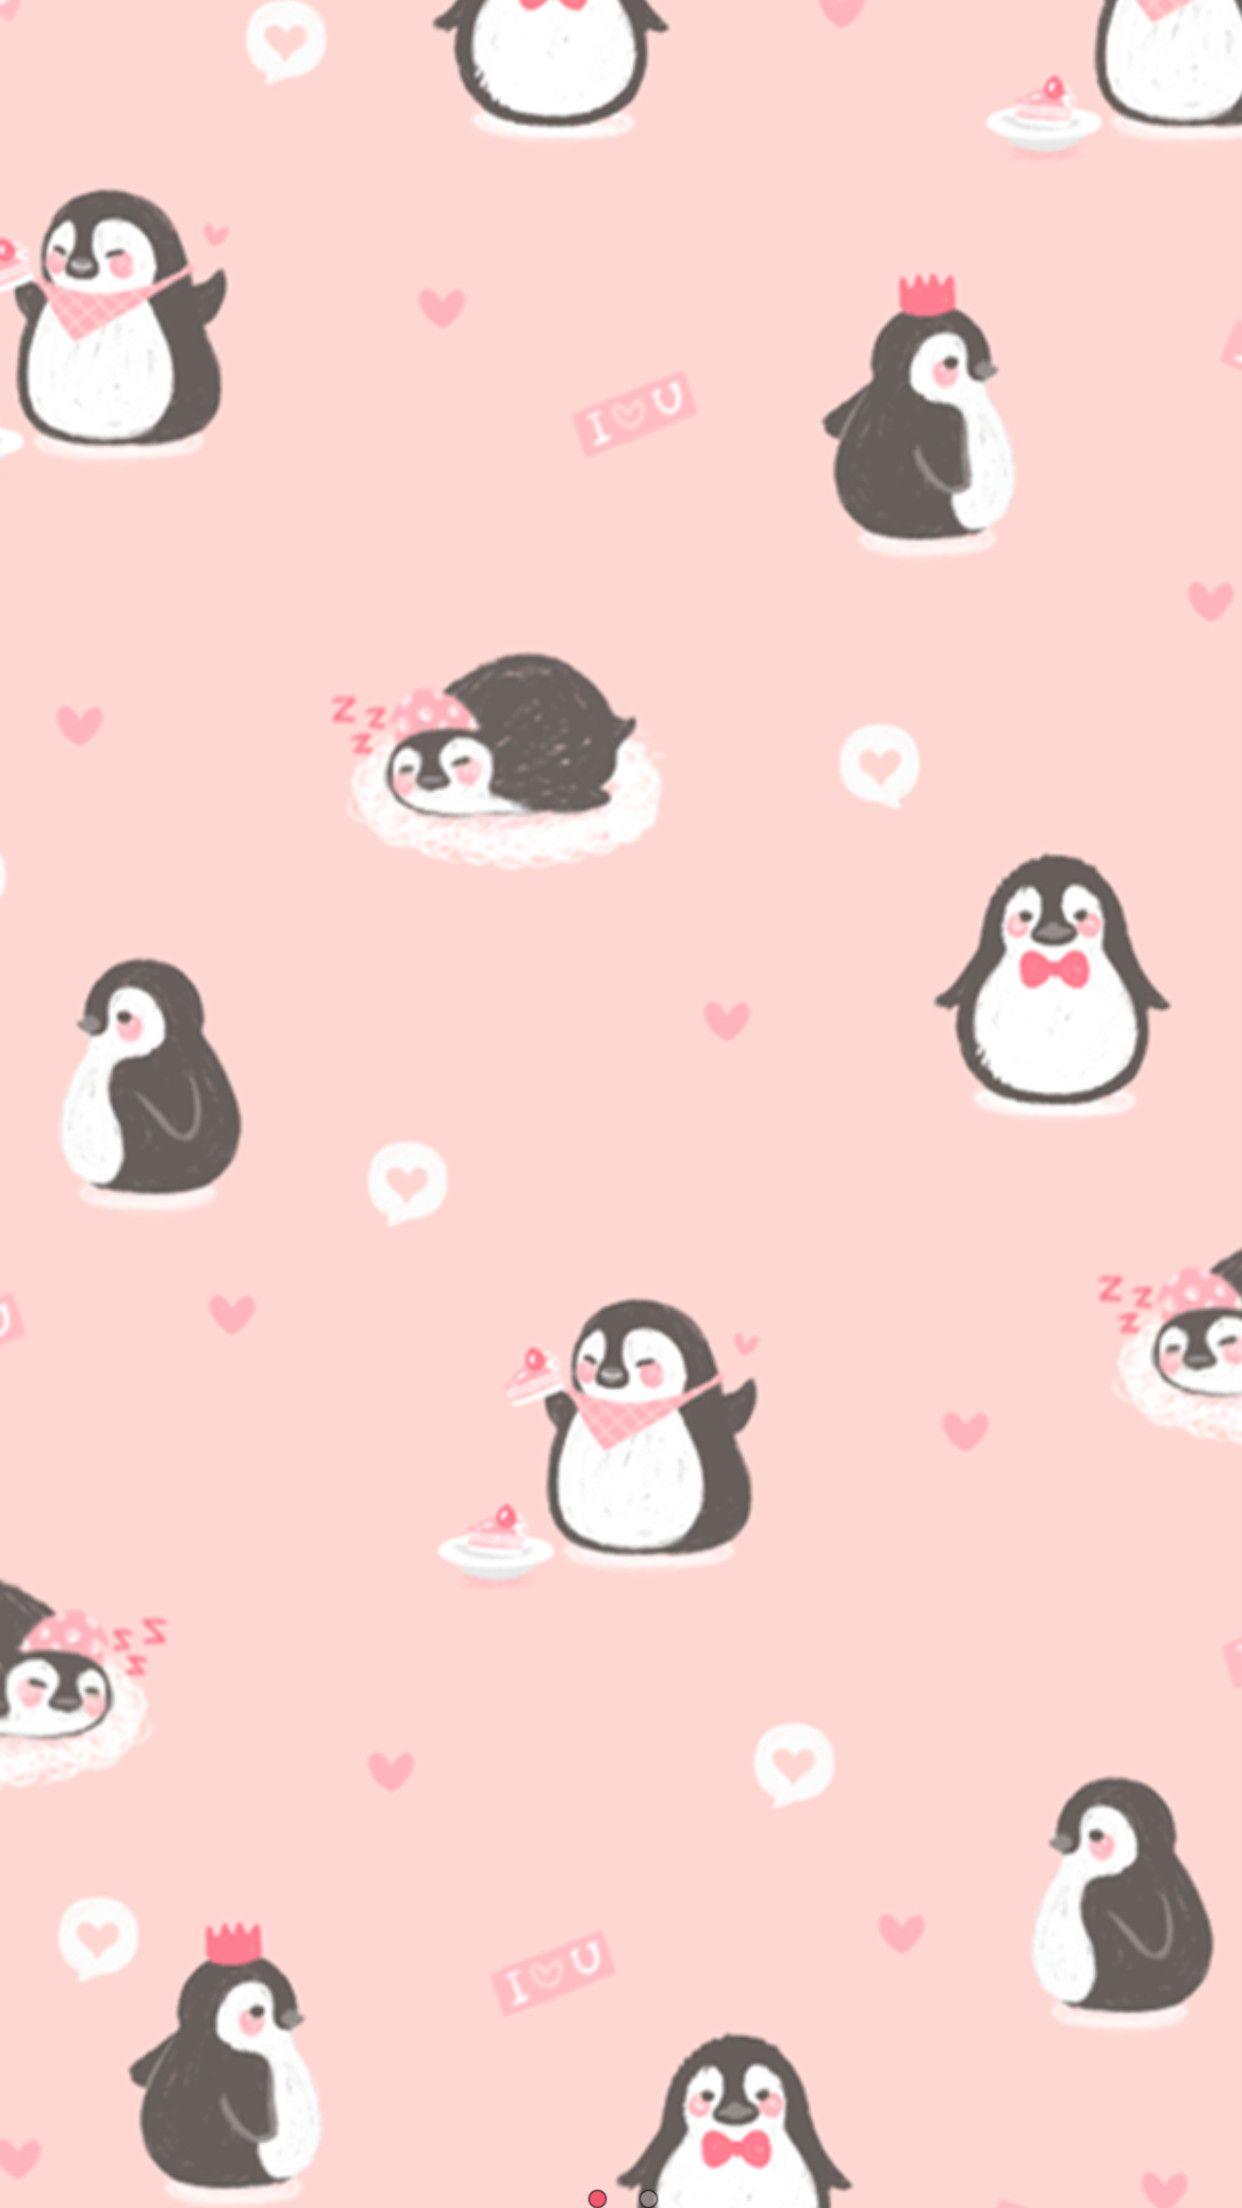 Penguin Wallpapers 57 Best Free Penguin Hd Wallpaper For Iphone Cute Christmas Wallpaper Penguin Wallpaper Wallpaper Iphone Cute